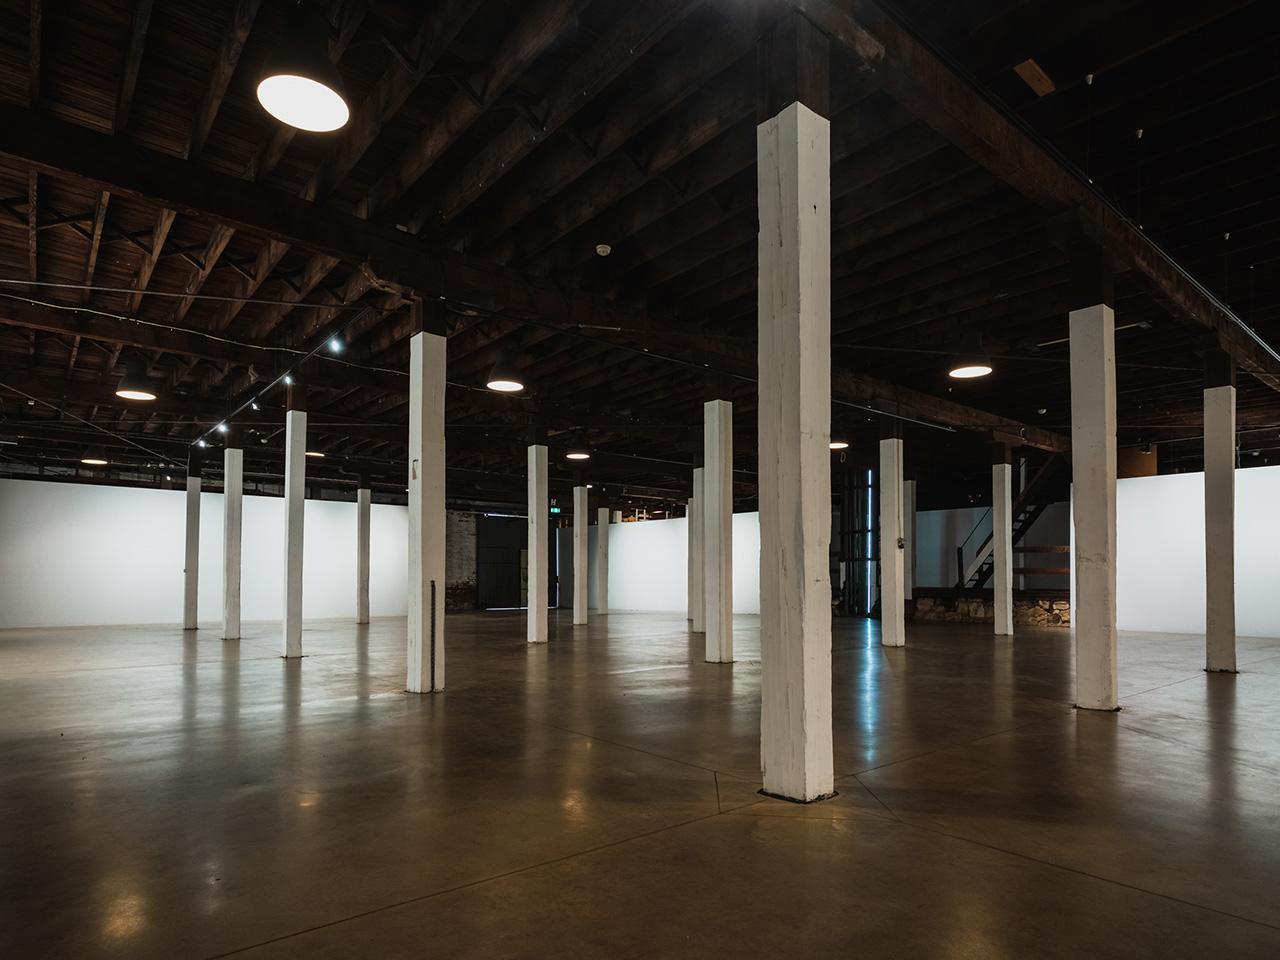 Blank Canvas Venue With Dim Lighting